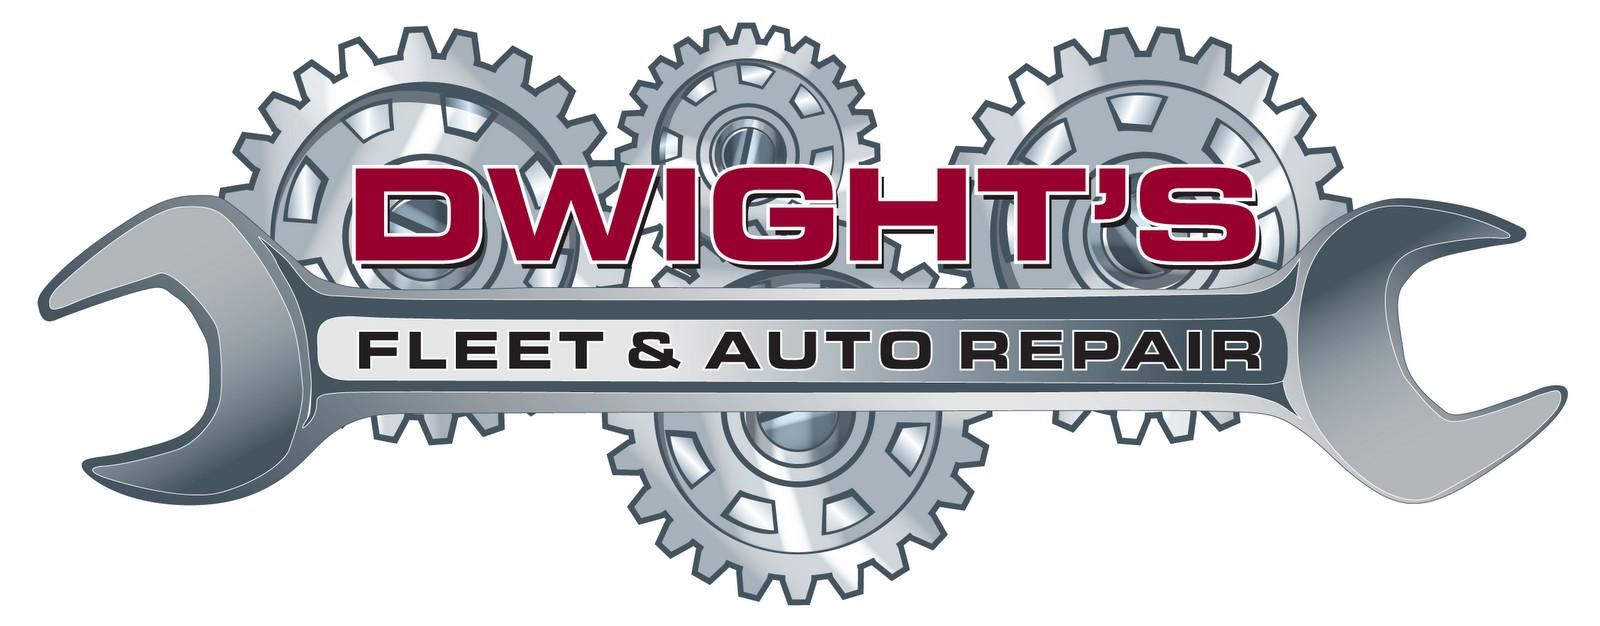 Auto Repair Logo Templates Auto Mechanic Logo Ideas